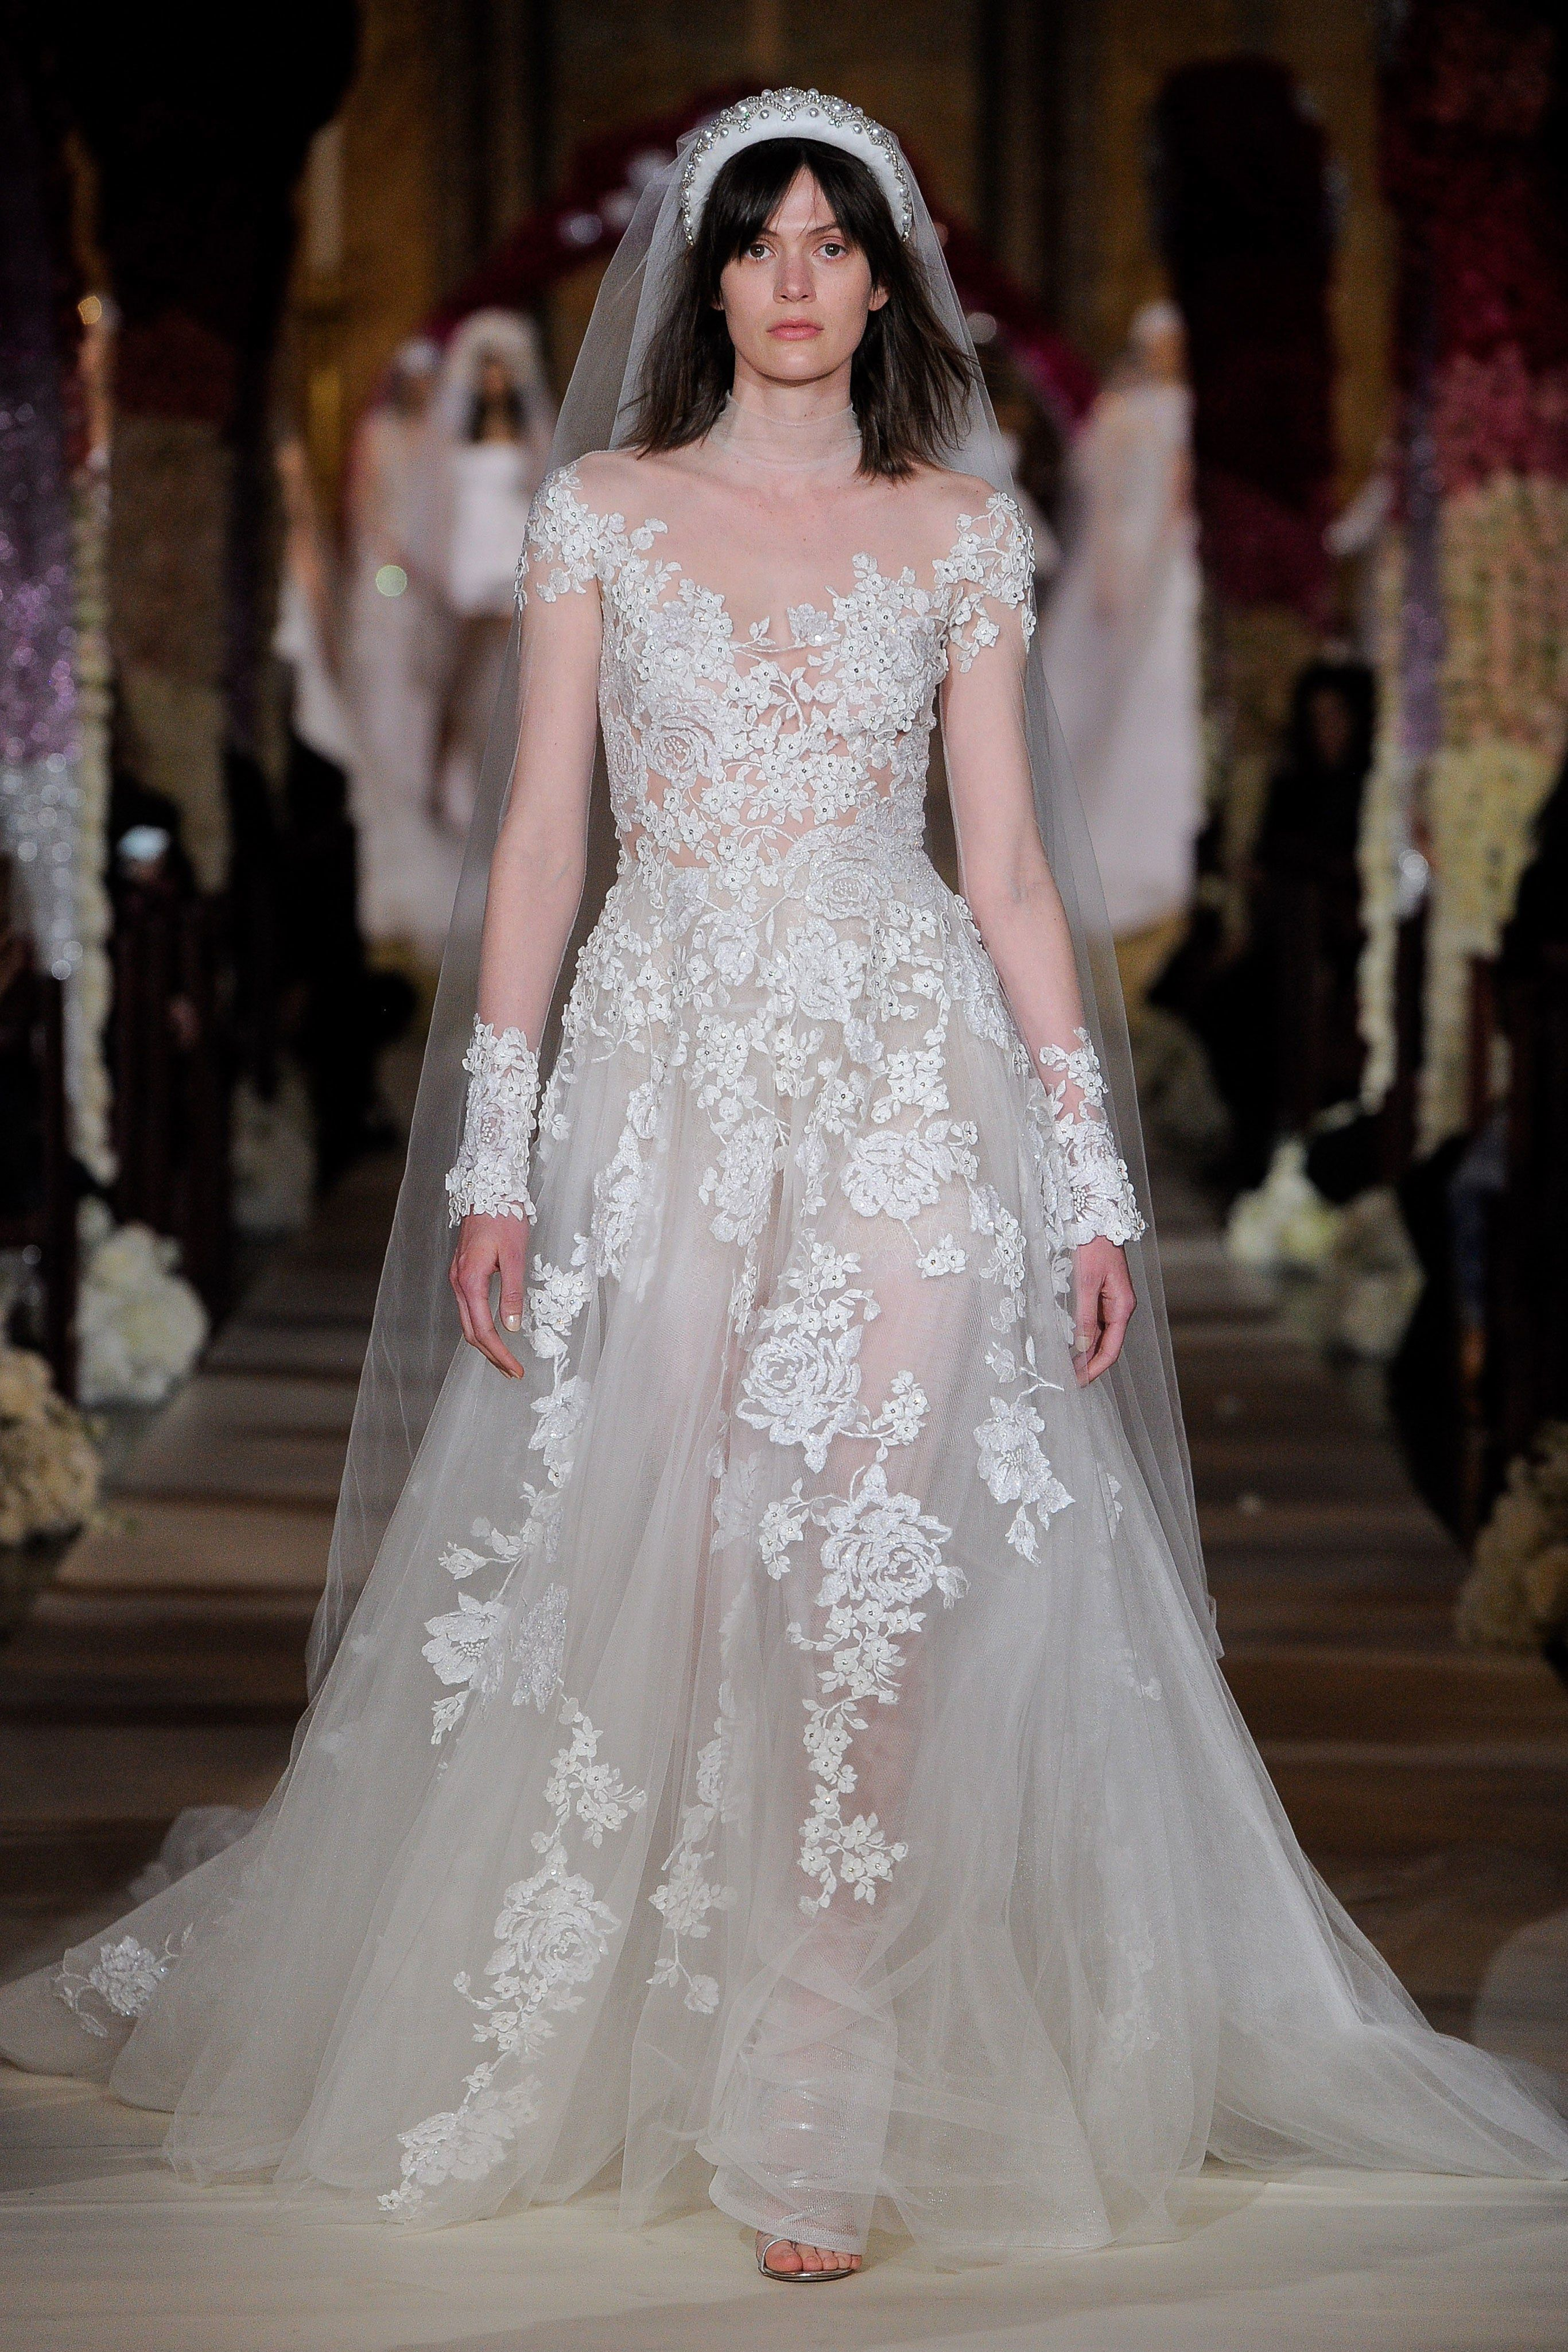 Reem Acra Bridal Spring 2020 Fashion Show Reem Acra Wedding Dress Trendy Wedding Dresses Reem Acra Bridal